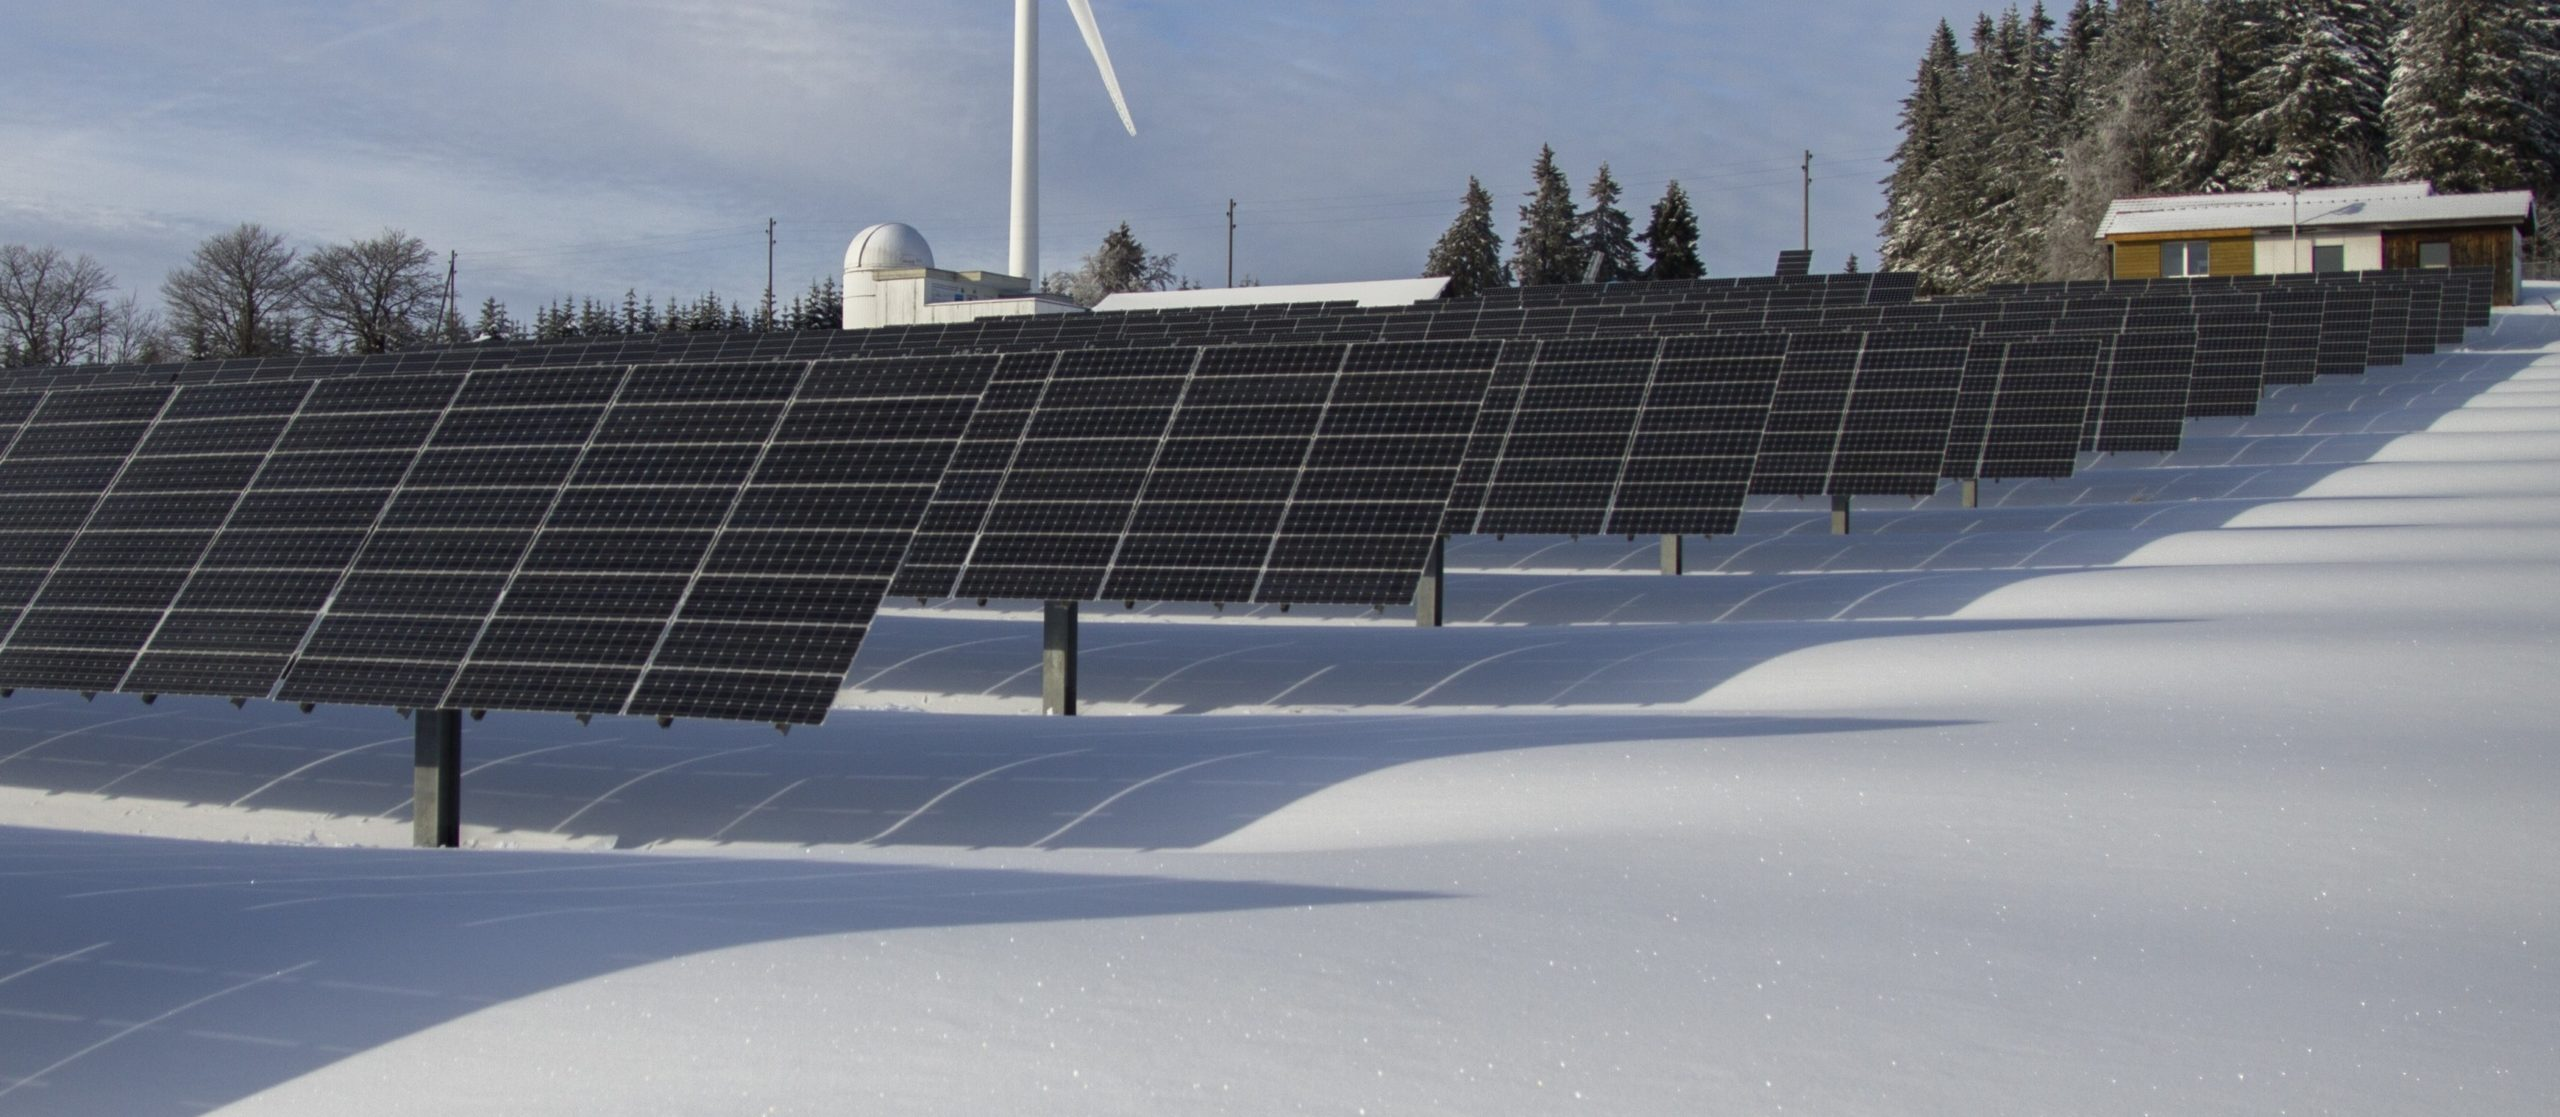 solar panel installation now